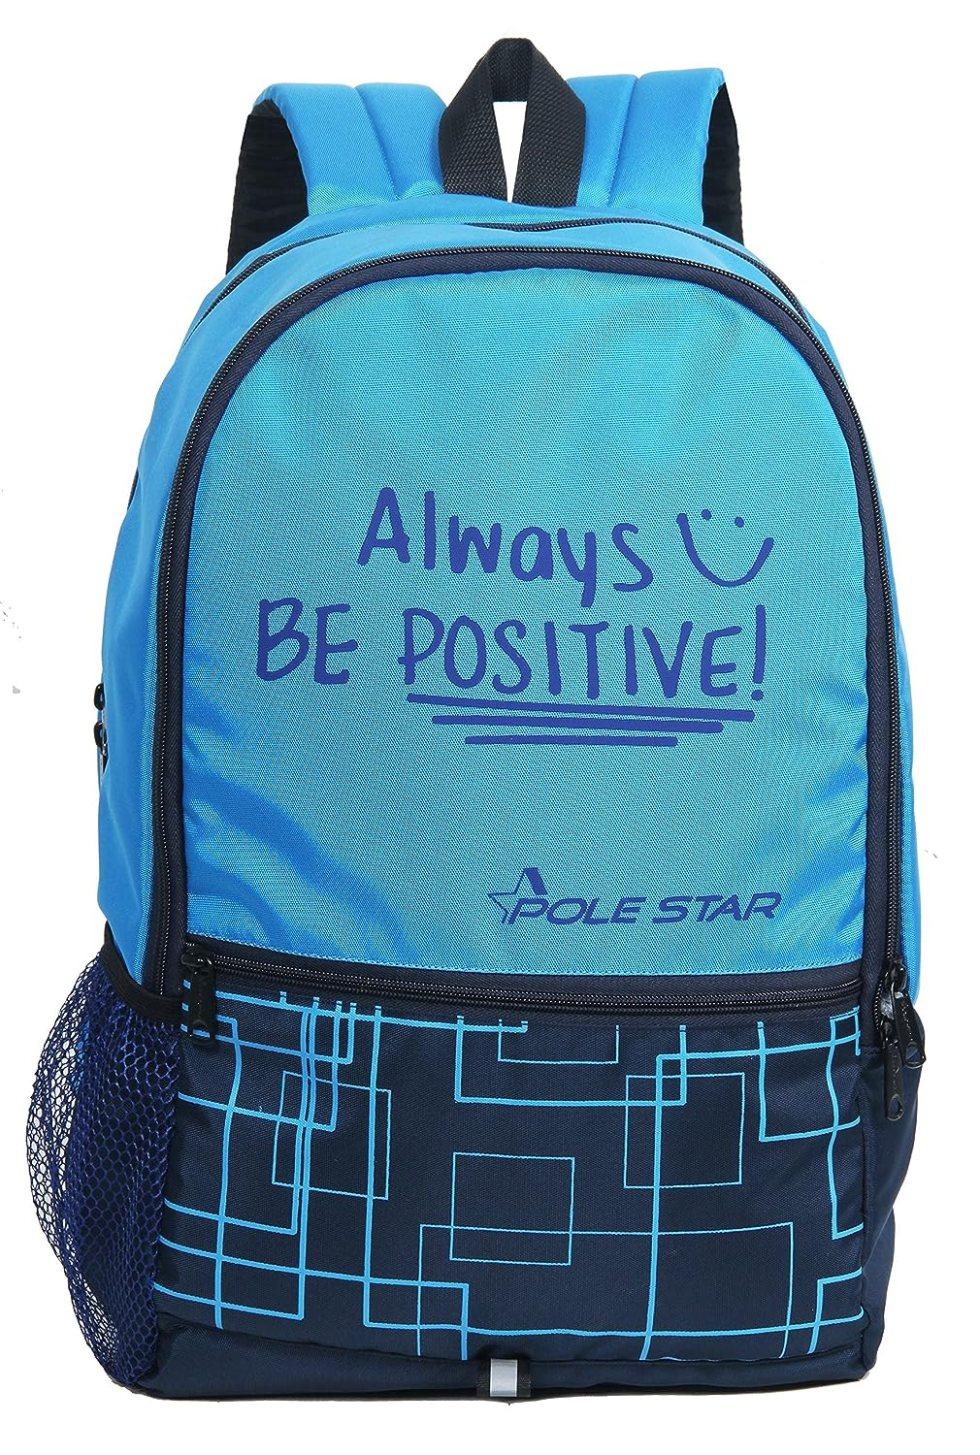 Hero 32 Lt Sky & Navy Casual Backpack/Day Pack Bag  under Polestar Travel Bag